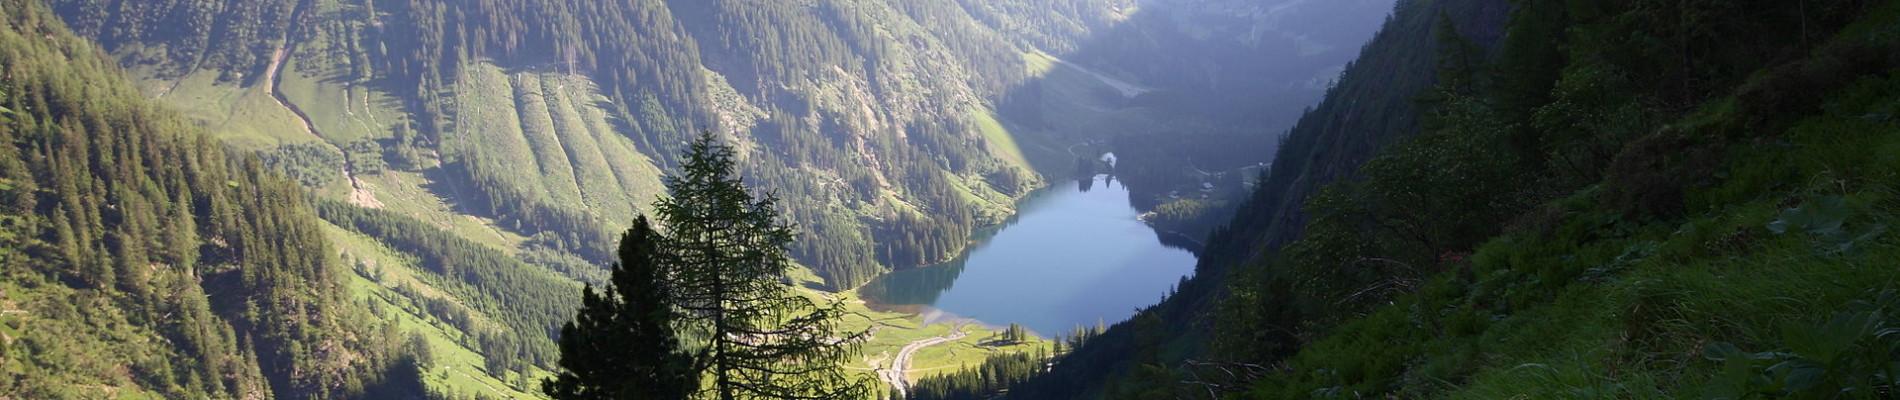 schwarzensee naturpark cc-by-sa3_0 ewaldgabardi